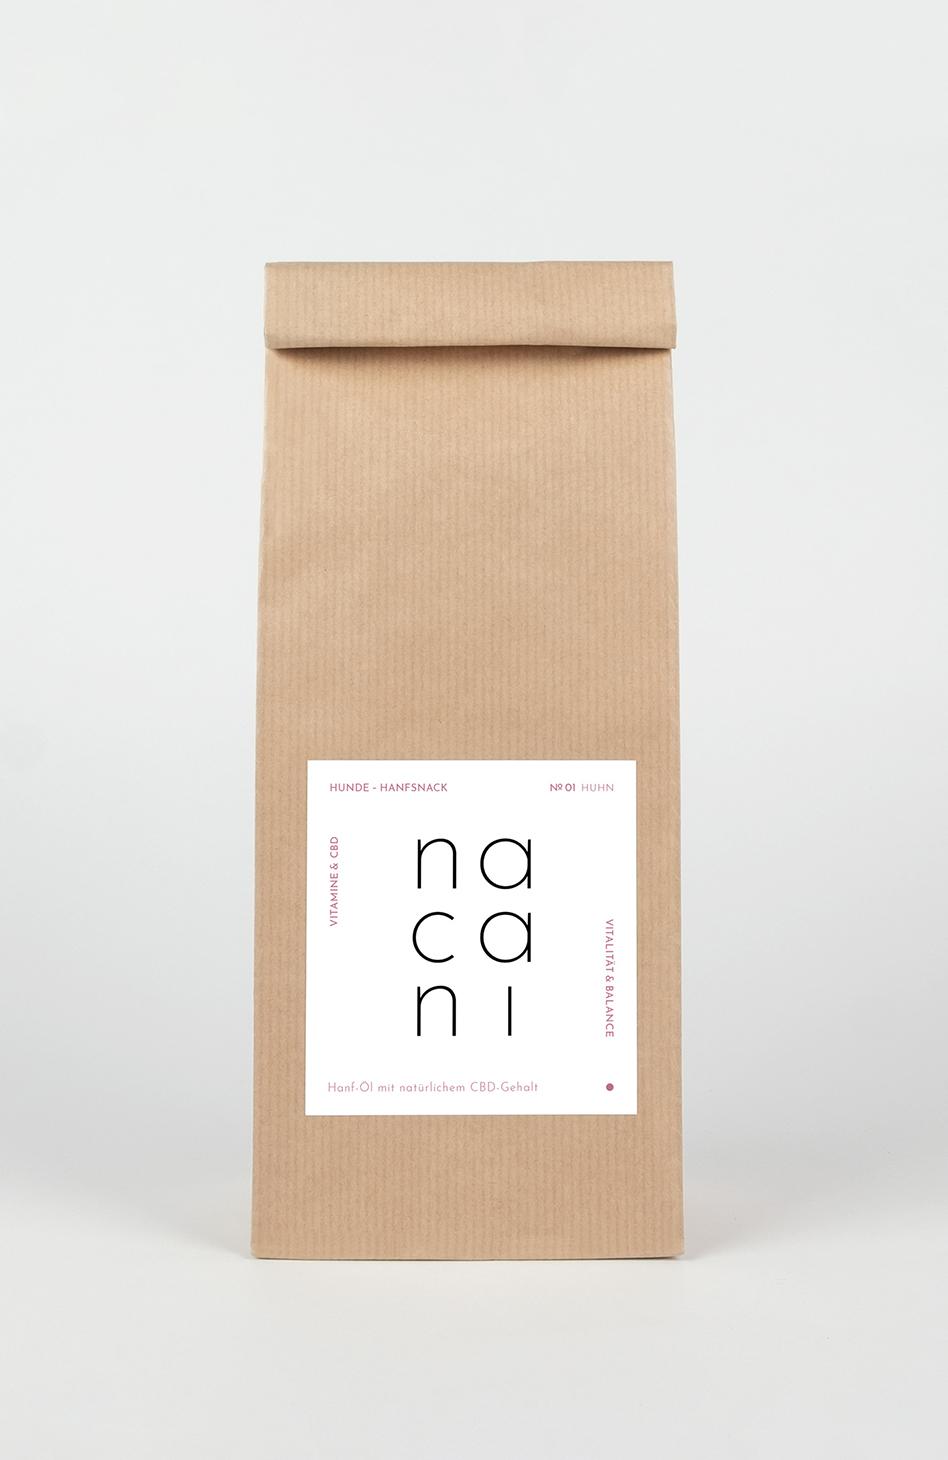 nacani-cbd-hund-snack-leckerli-hundekeks-produkt-huhn-nachfuellpack-L